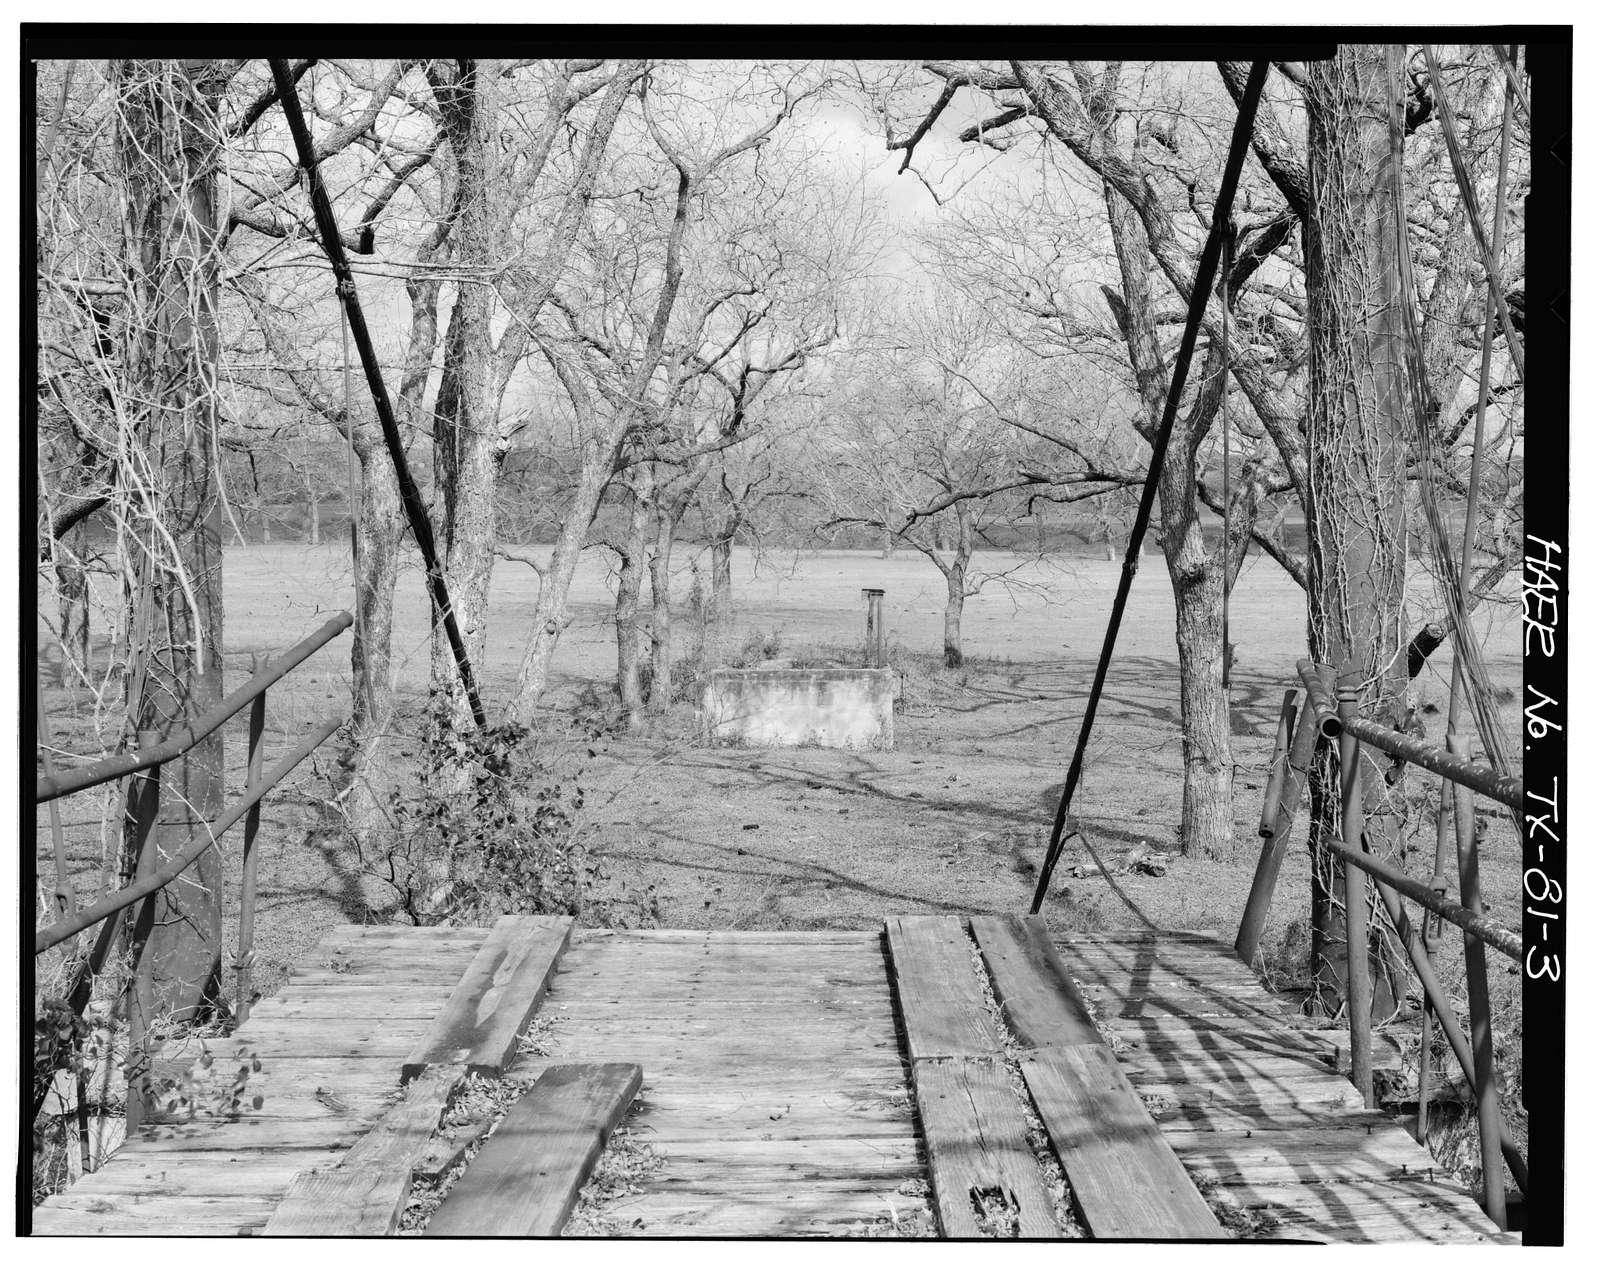 Rock Church Suspension Bridge, Spanning Paluxy River, Tolar, Hood County, TX